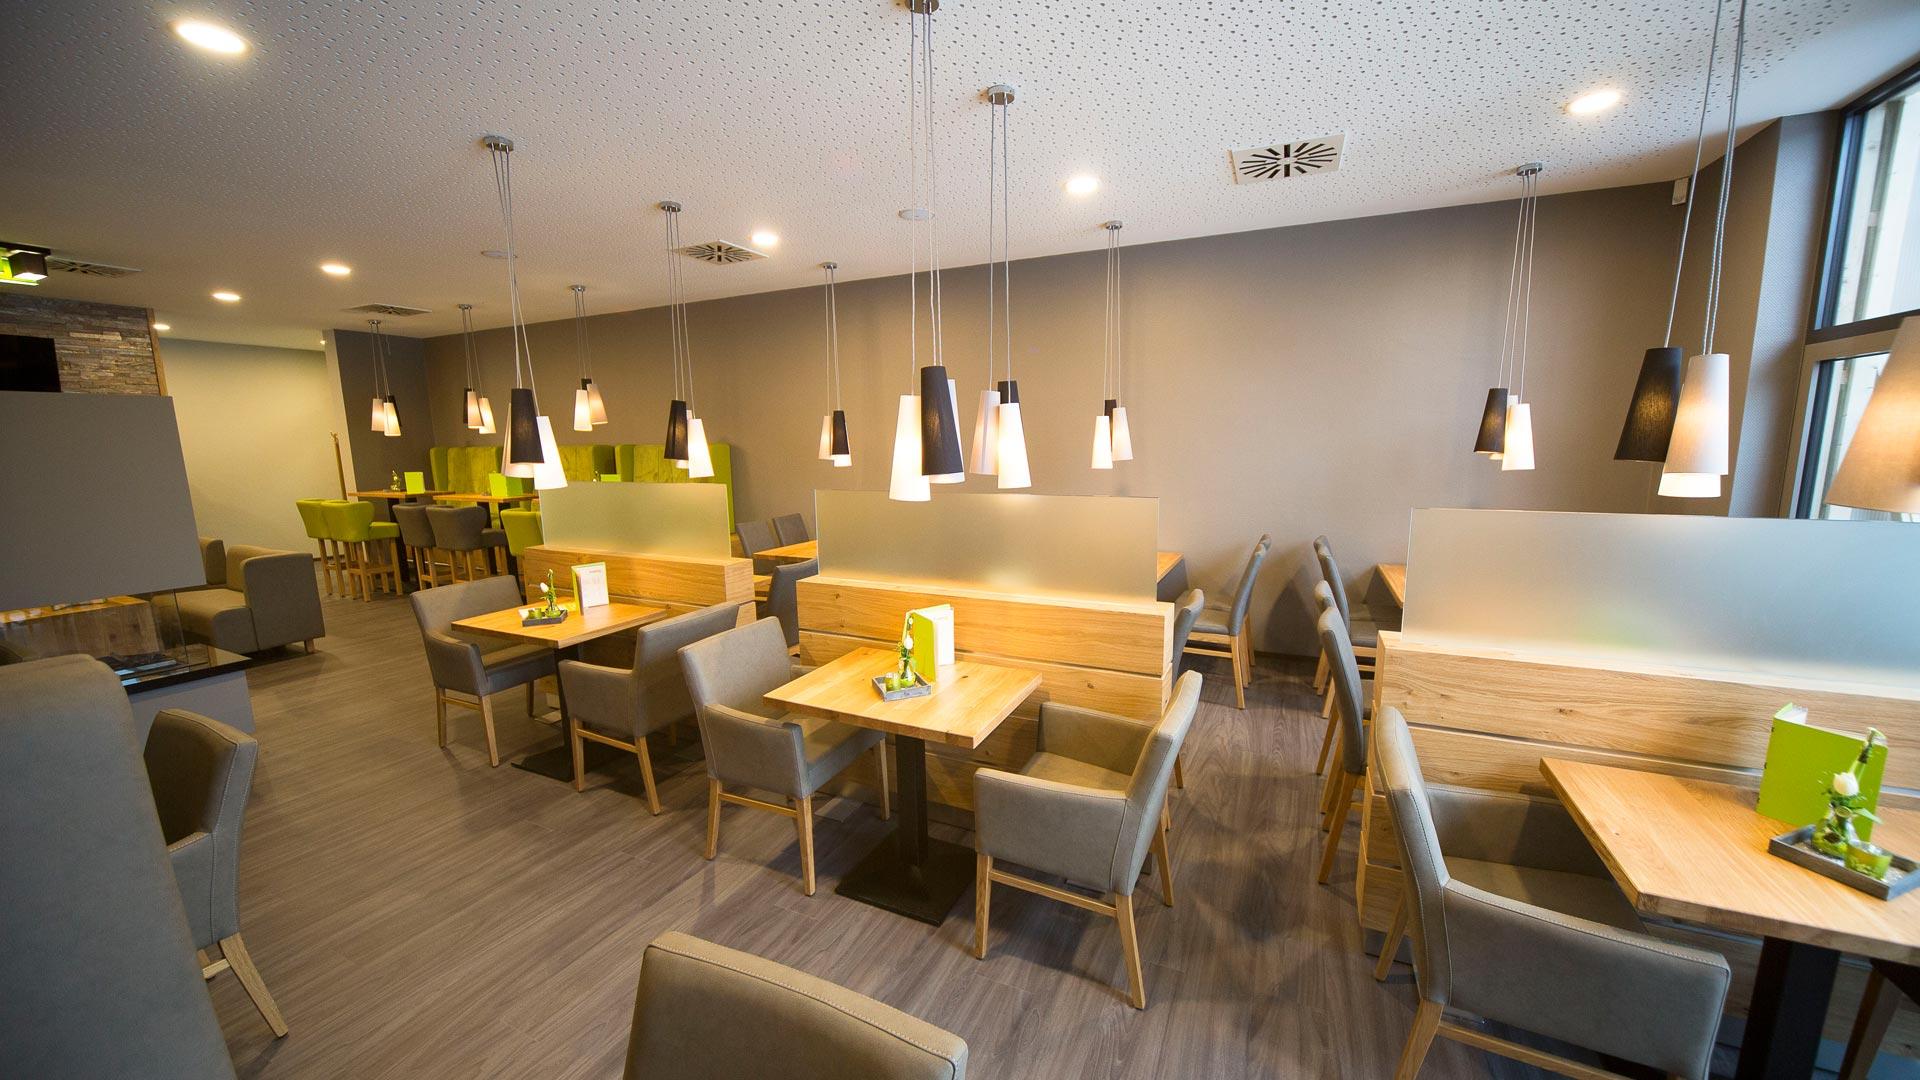 MAASS-Lichtplanung_Lichtplanung für Gastronomiebereich__MAASS-Auszeit-Gastronomie-002